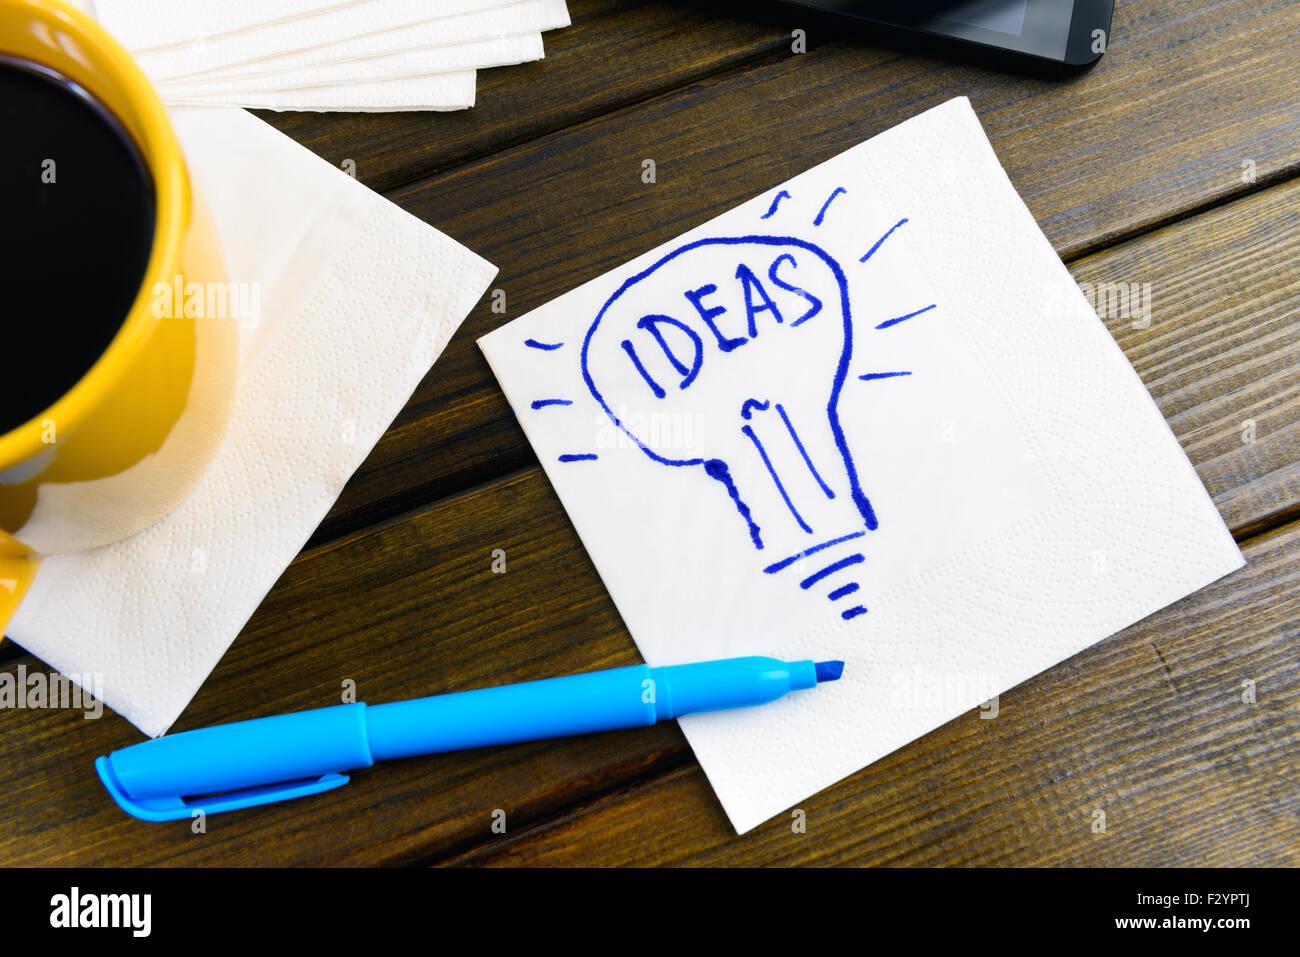 napkin sketch light bulb Ideas - Stock Image